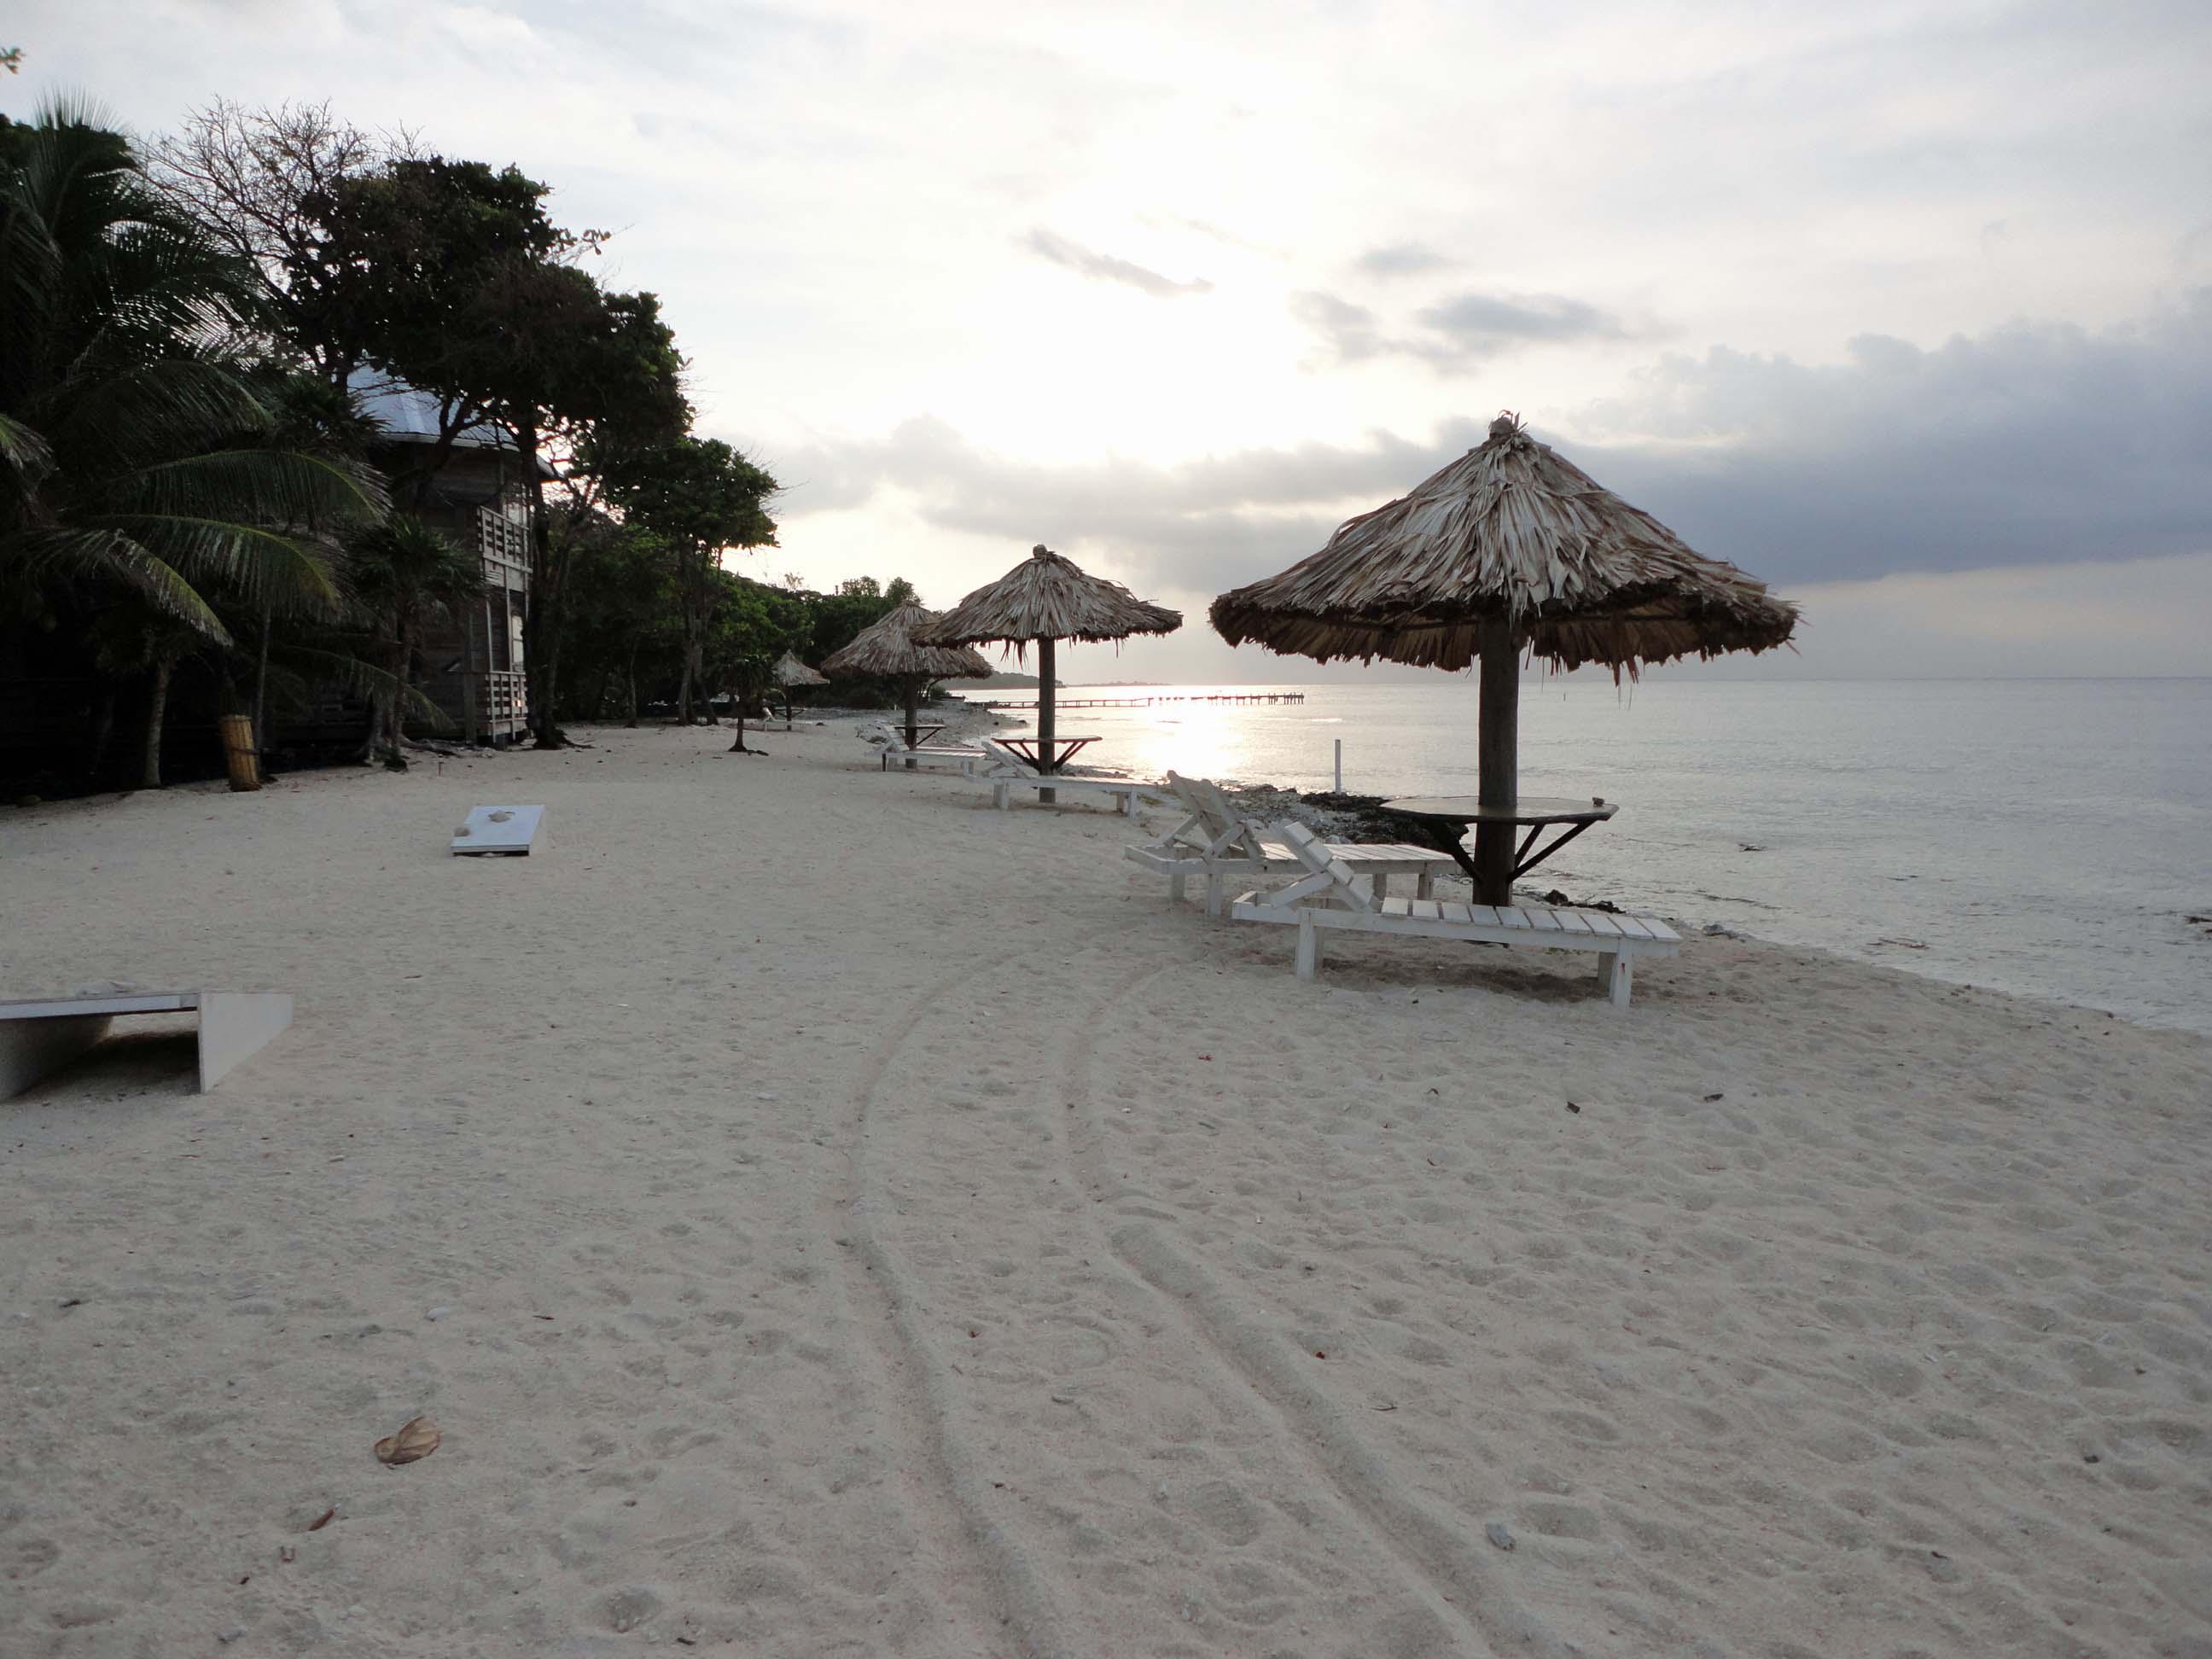 Utopia, Utila Island, Bay Islands, Honduras